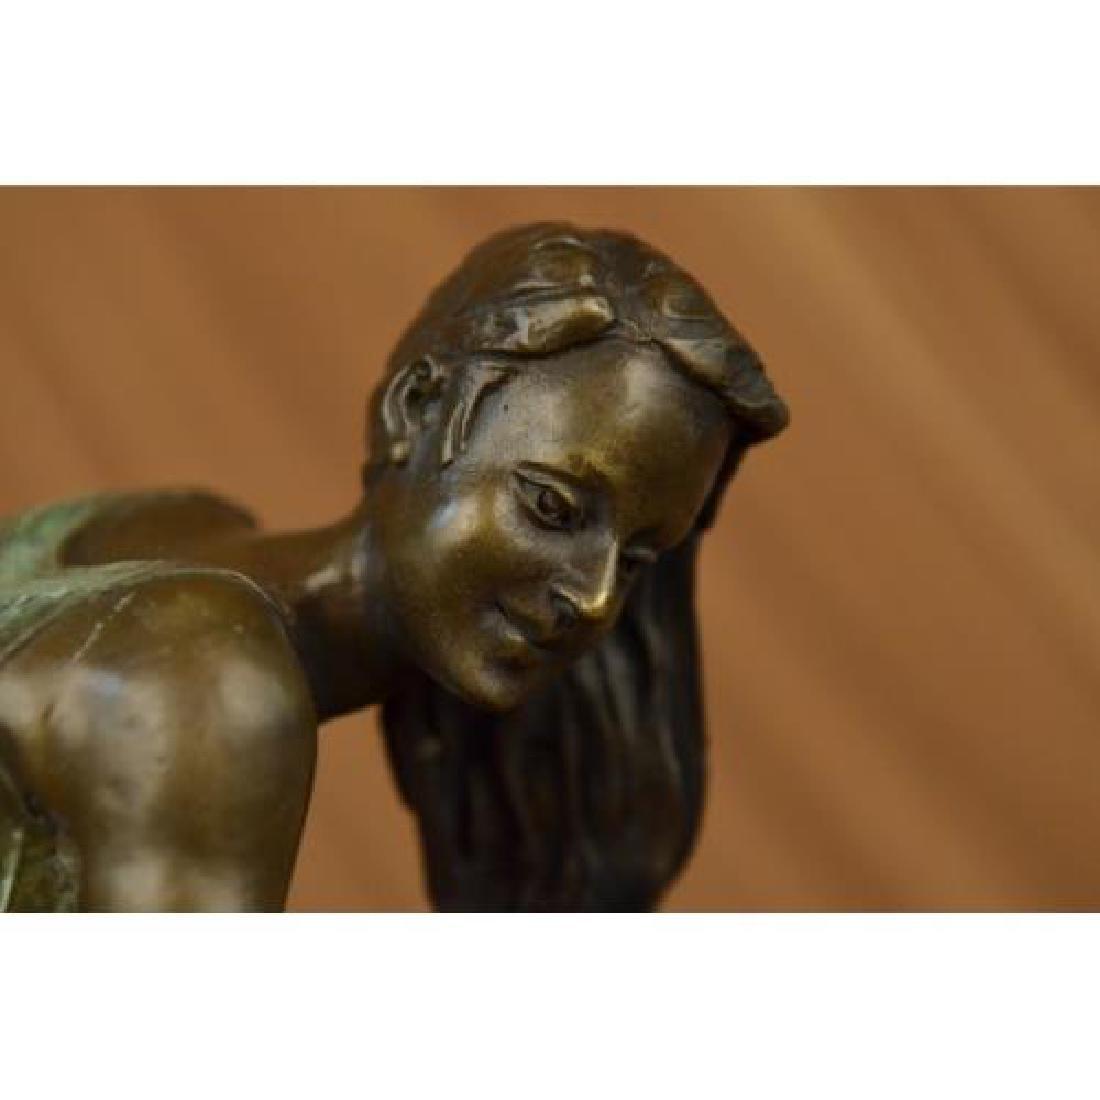 Exotic Stripper Nude Bronze Sculpture - 5